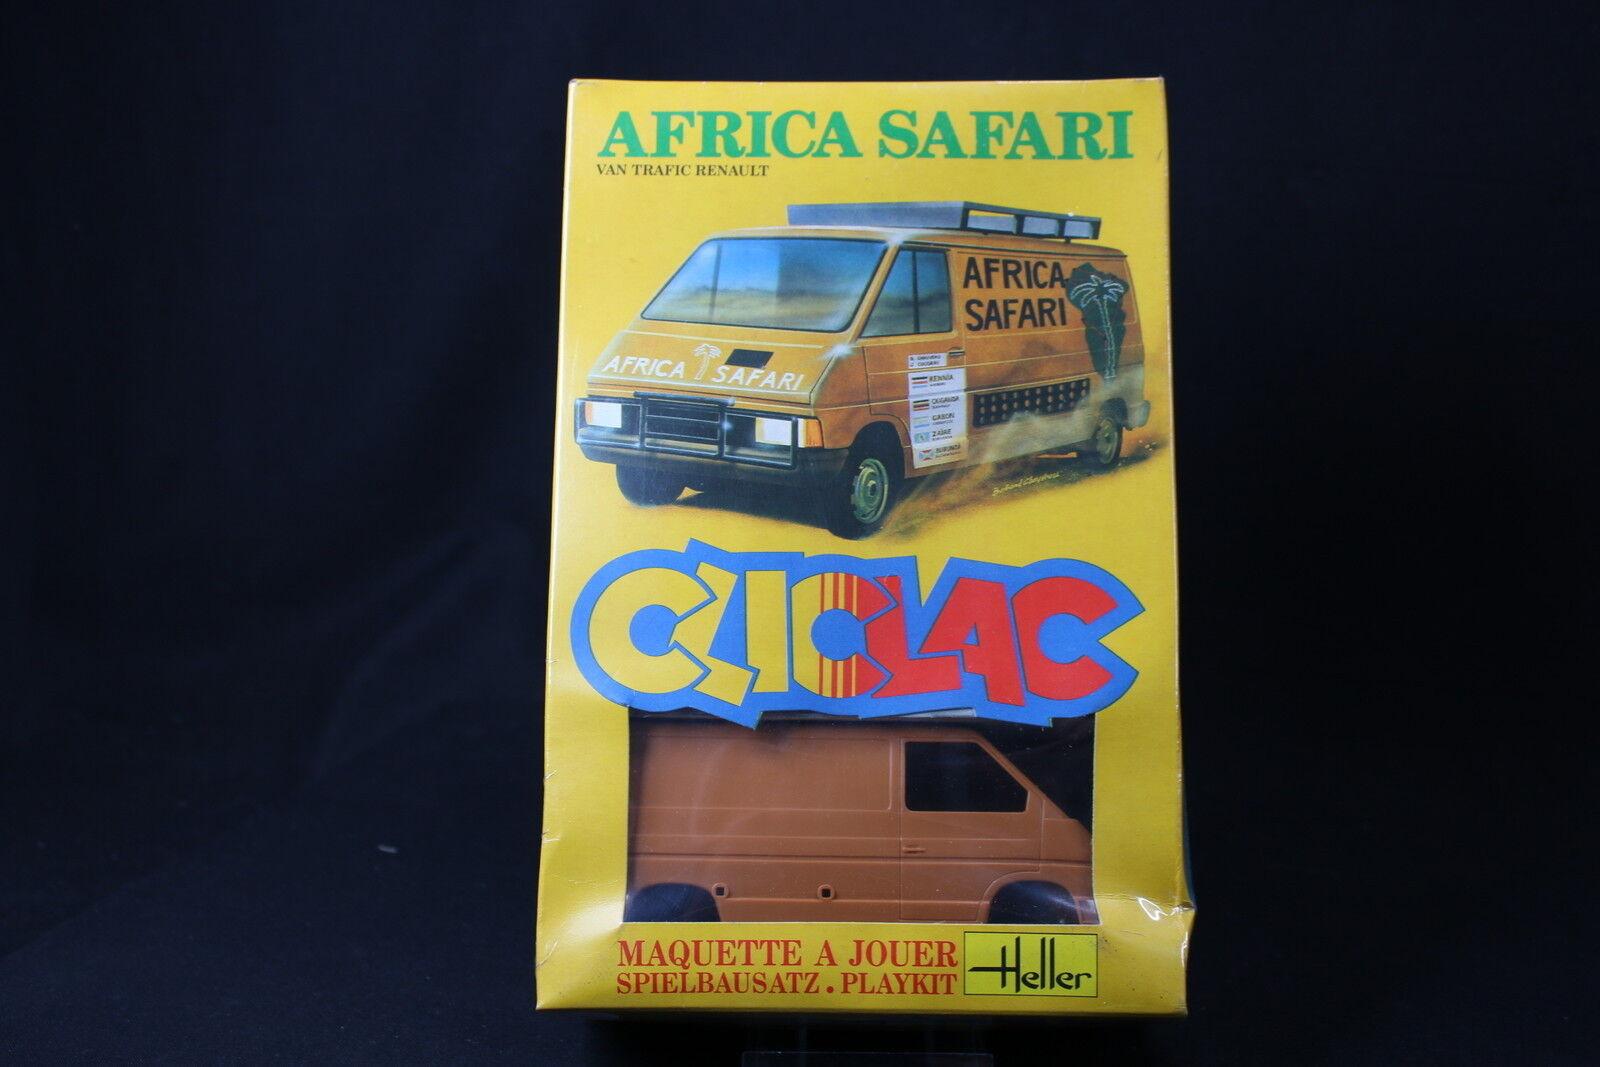 YQ071 HELLER 1 32 maquette cliclac camion 2004 Van Trafic Renault Africa Safari